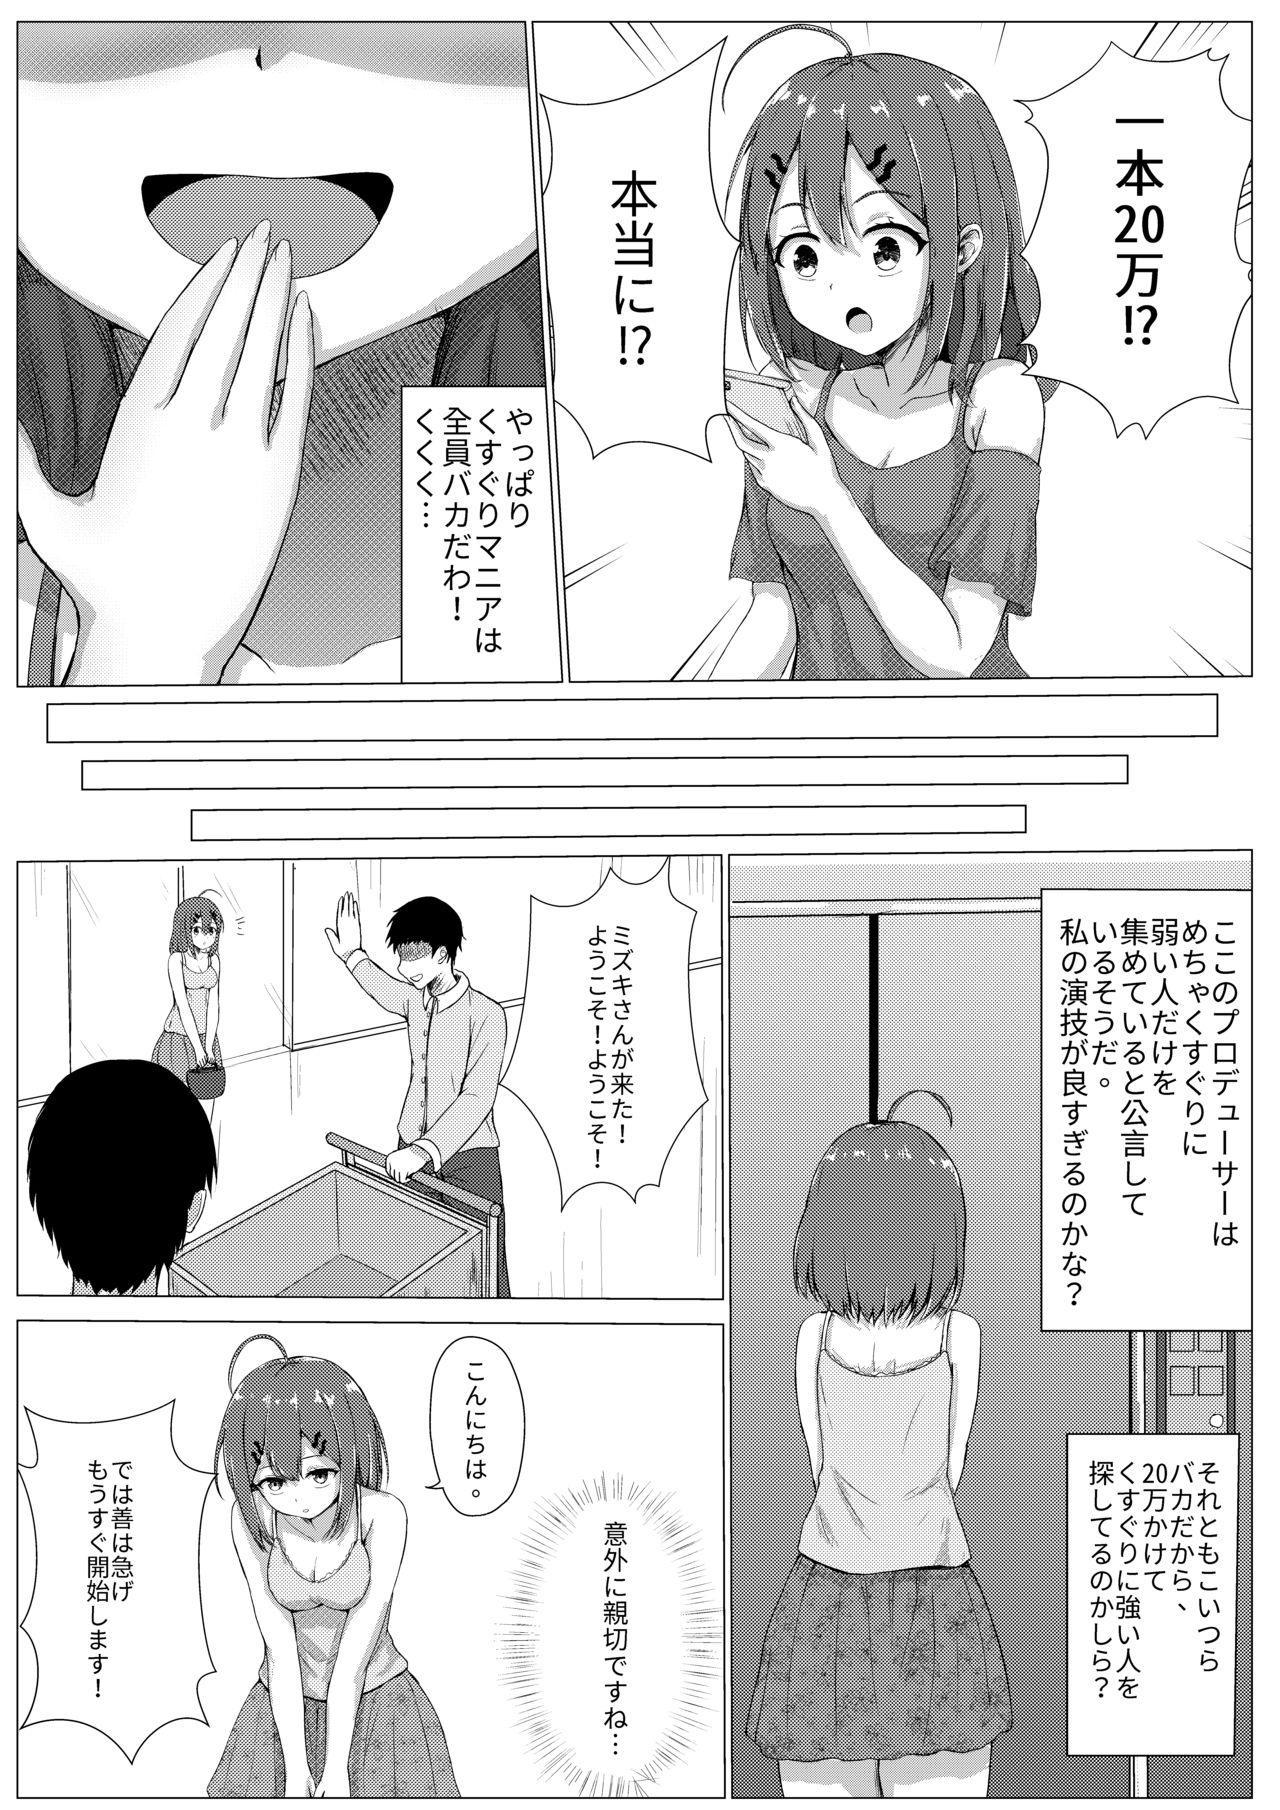 Kusuguri Joyo Oshioki 4